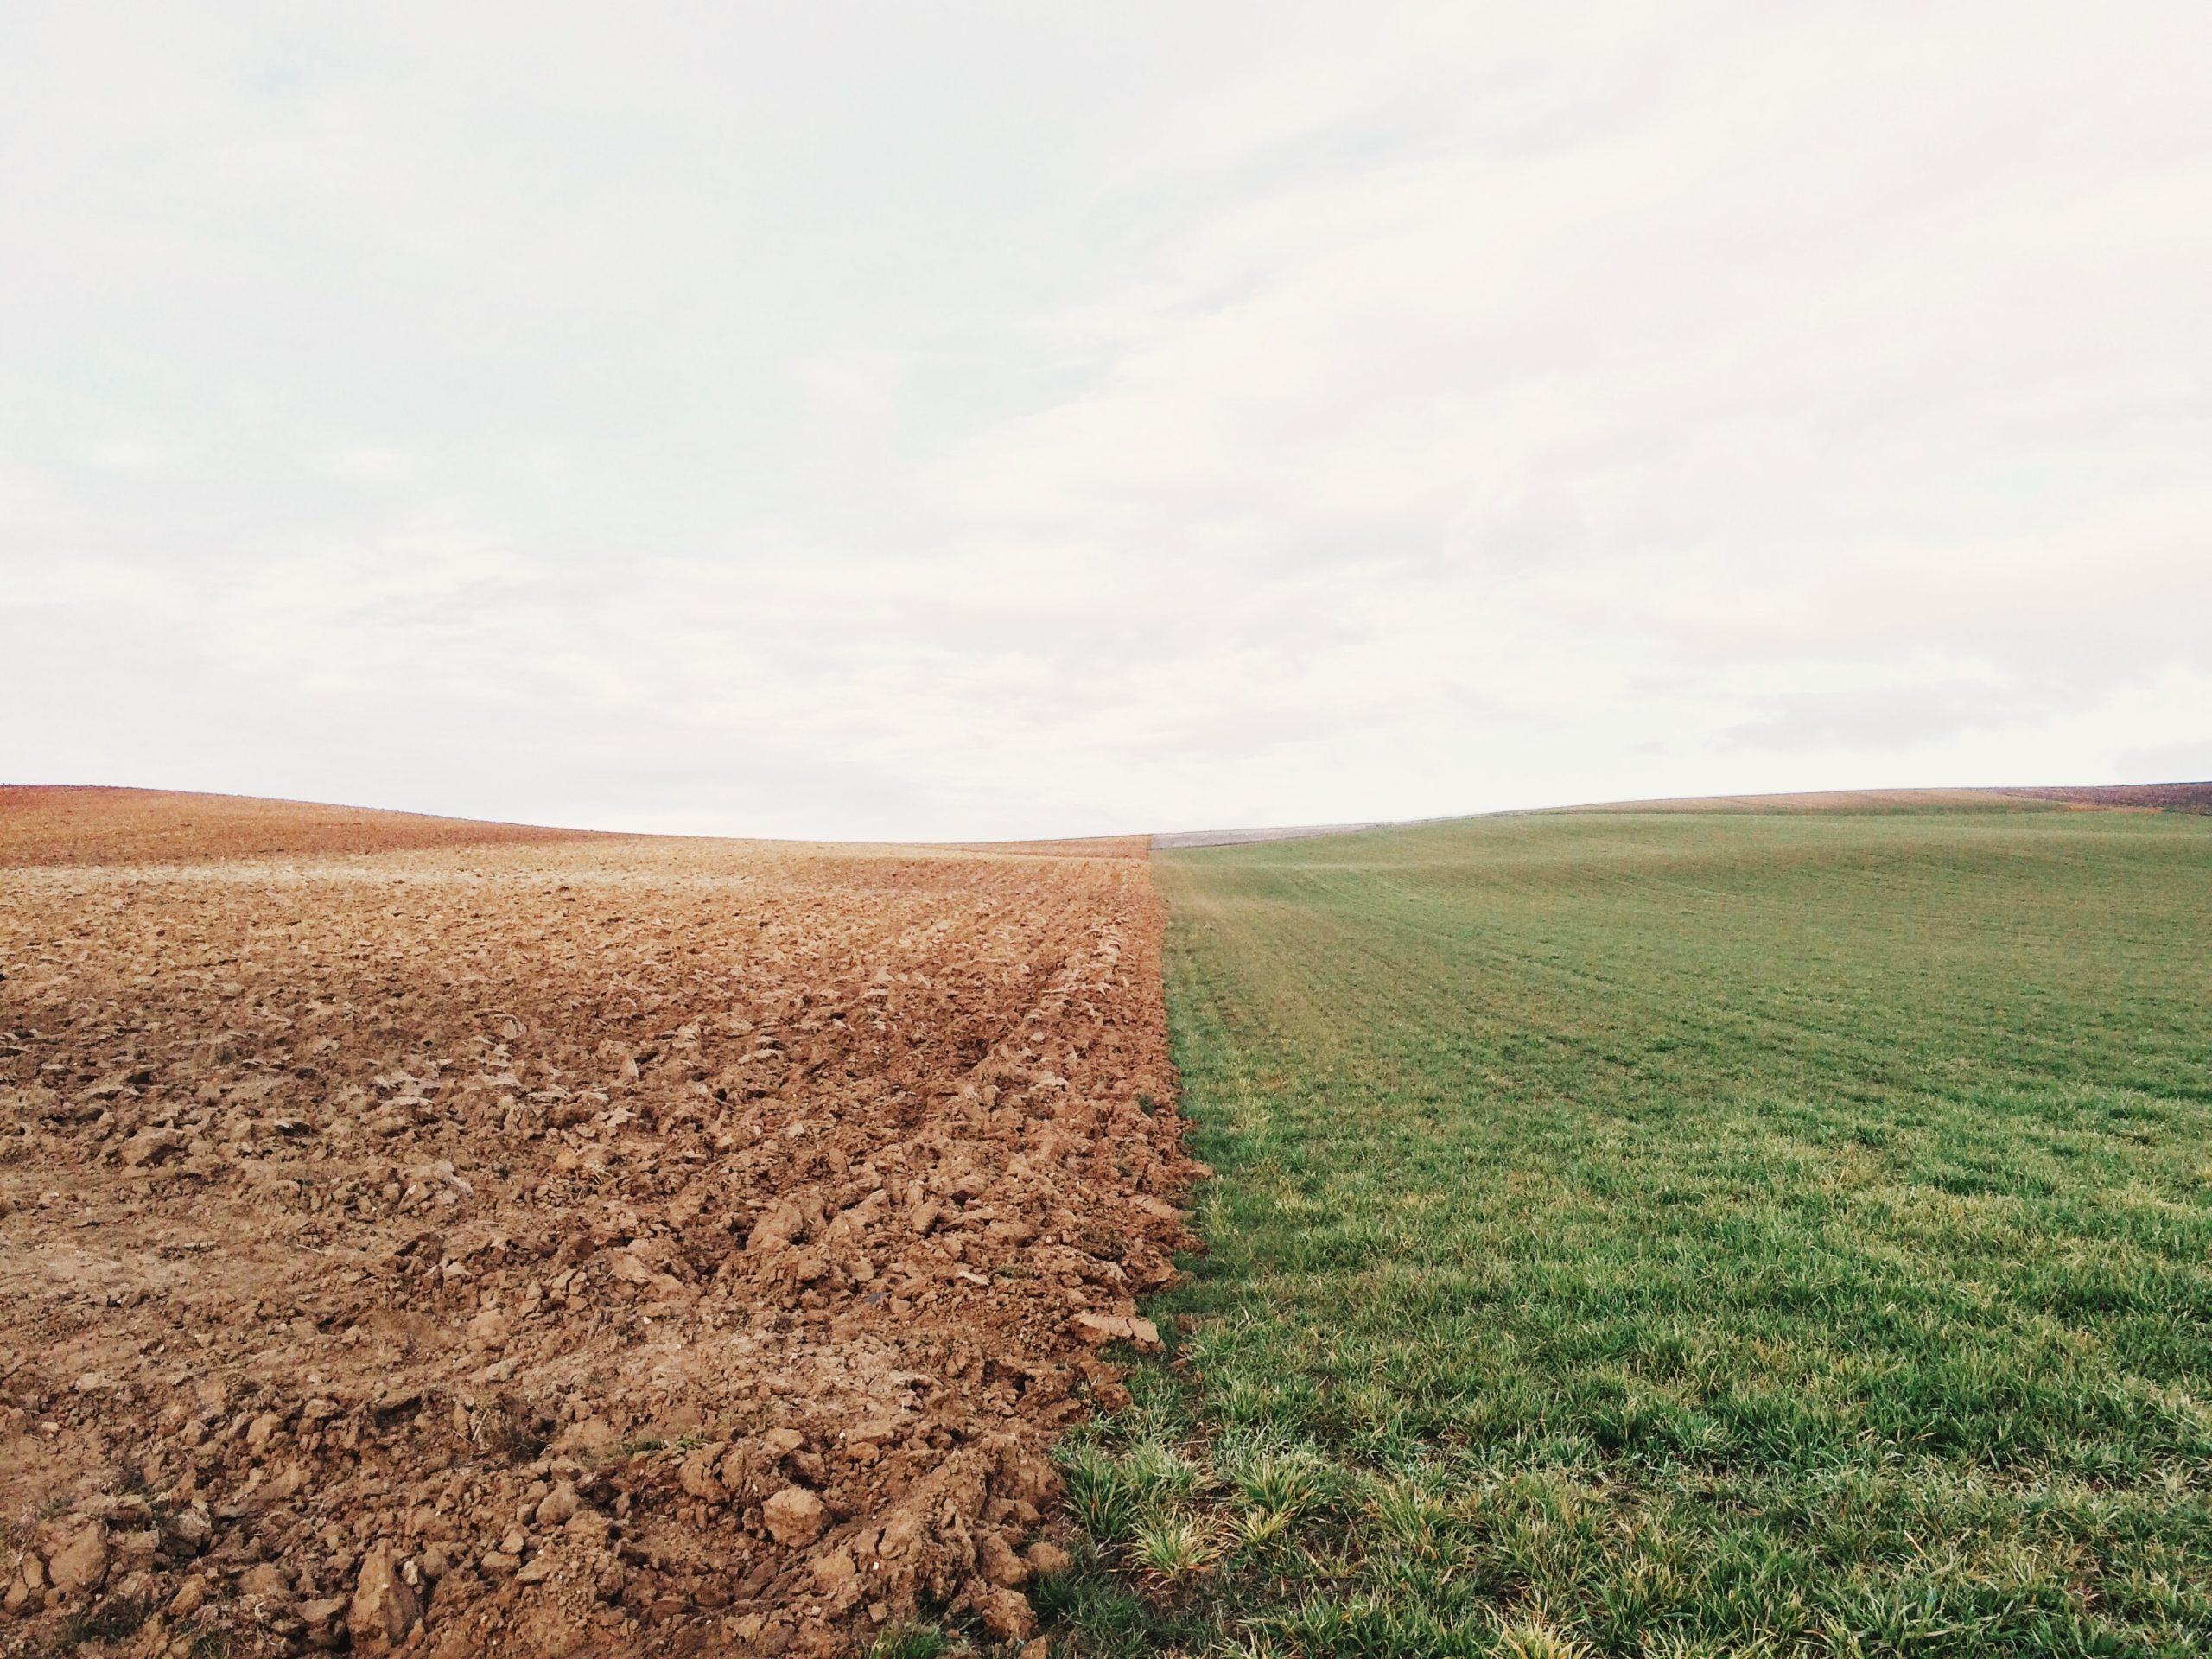 肥沃な大地と荒れ果てた大地